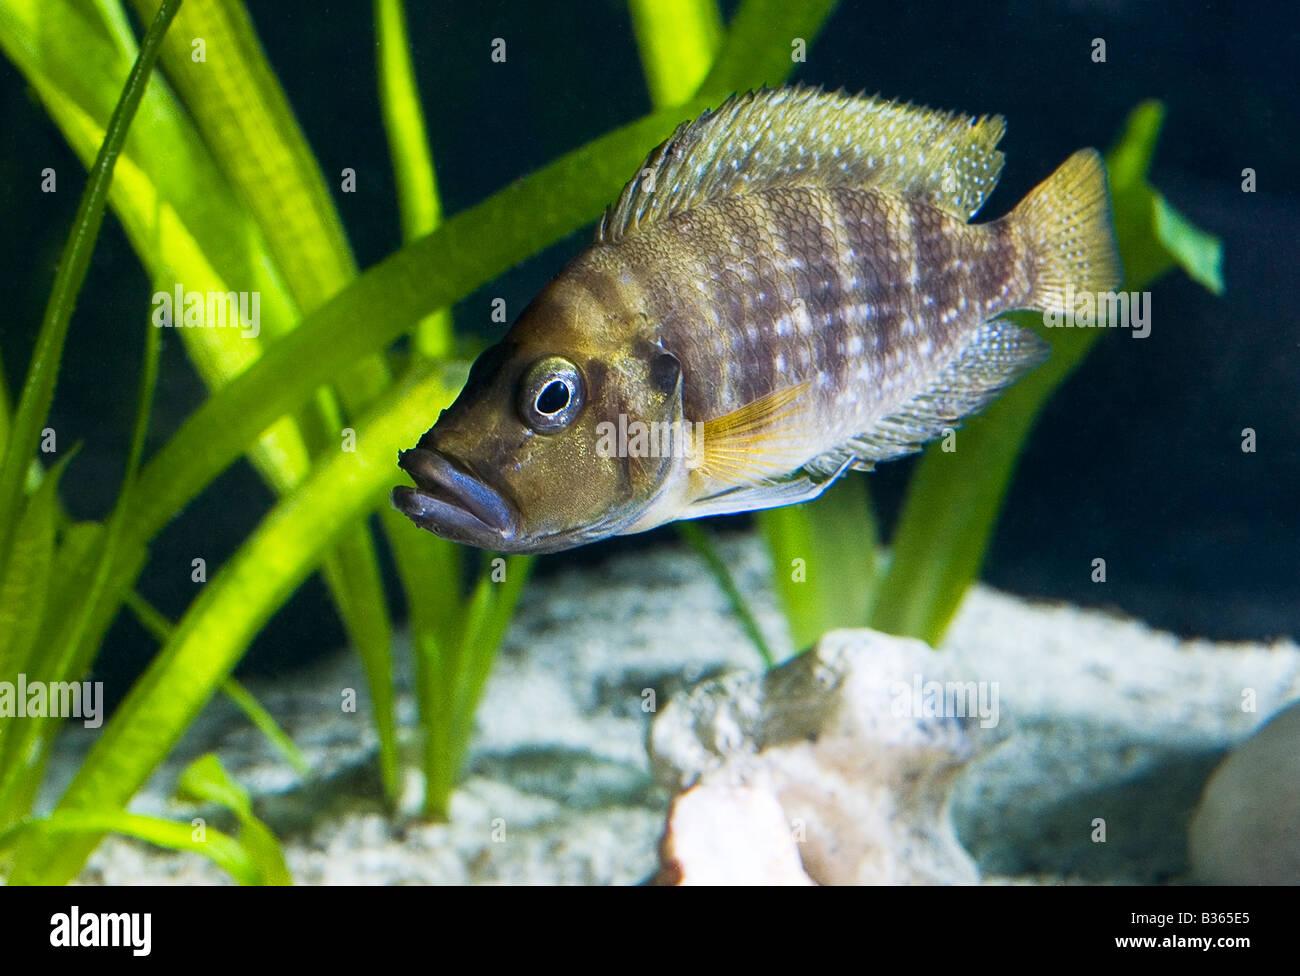 Cichlid Fish from Tanganyika - Stock Image